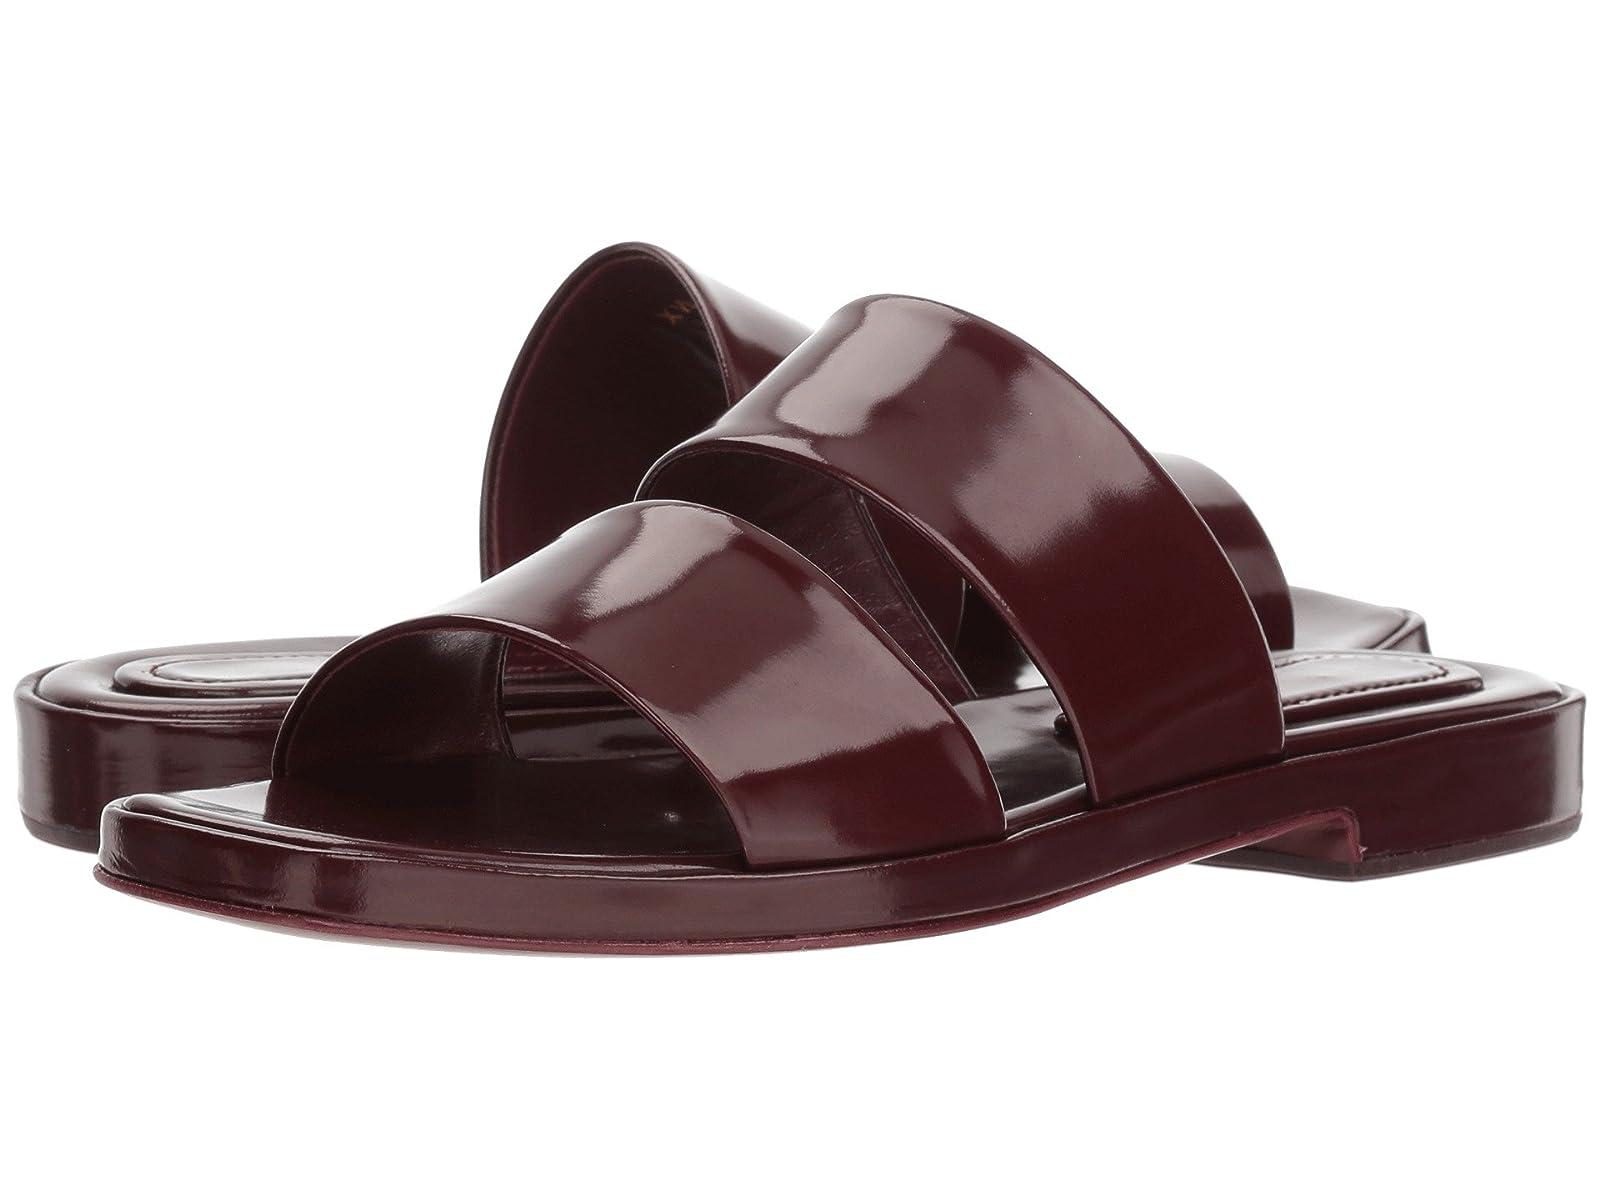 Stuart Weitzman WeekendCheap and distinctive eye-catching shoes